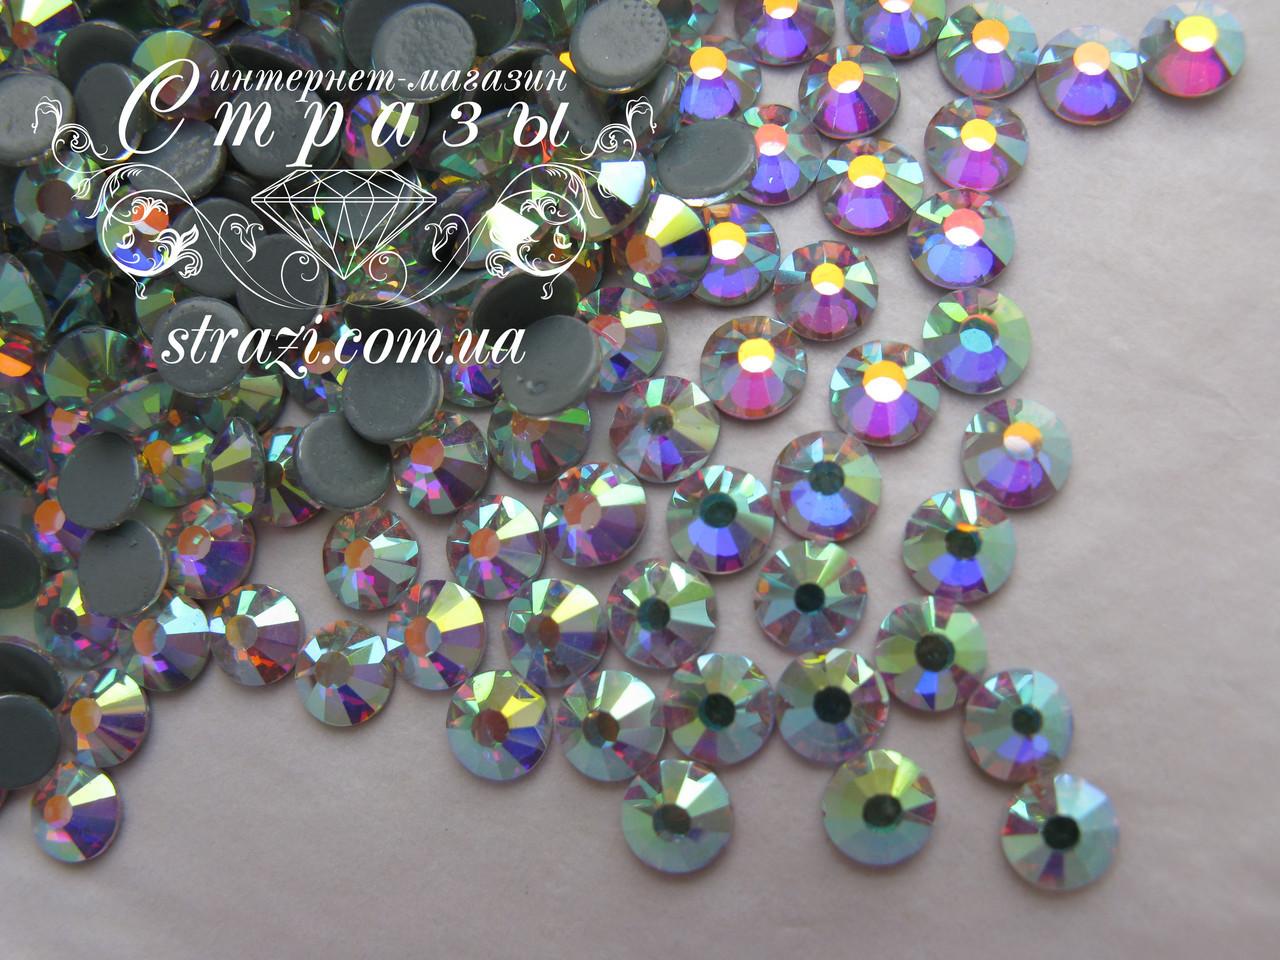 Термо стразы Lux ss16 Crystal AB (4.0mm) 100шт